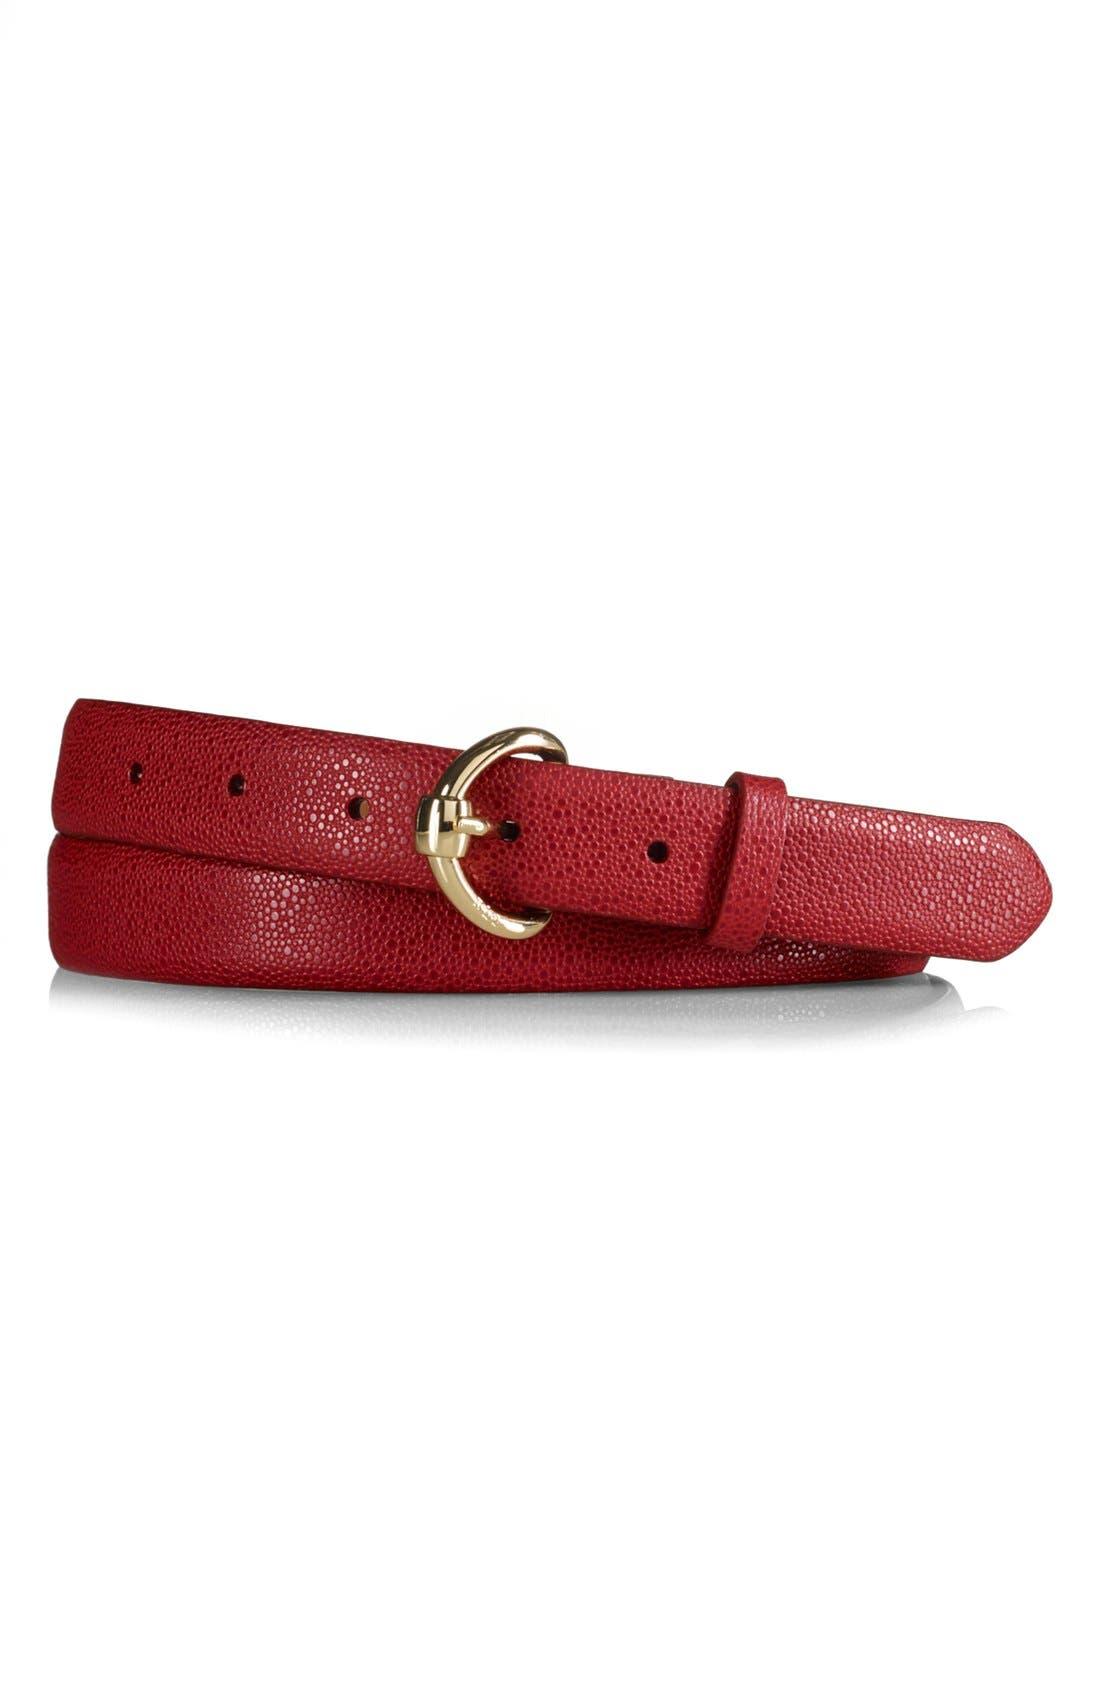 Alternate Image 1 Selected - Lauren Ralph Lauren Stingray Embossed Belt